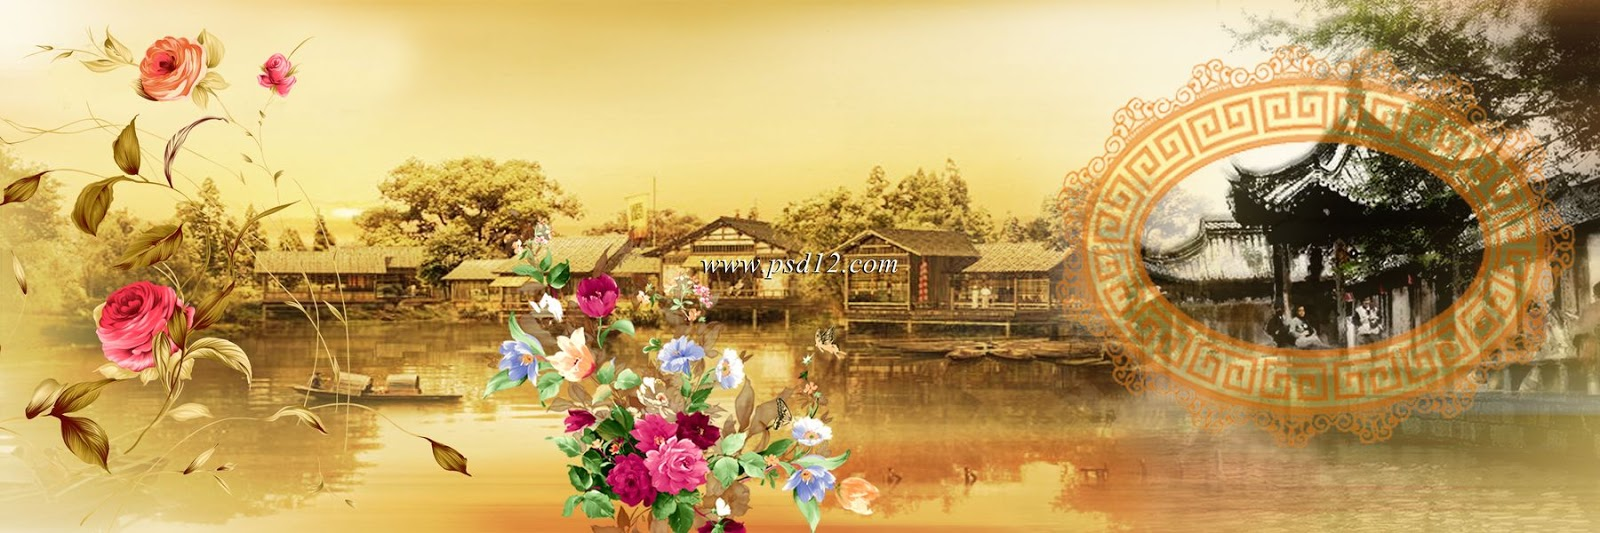 Photoshop Backgrounds: Wedding Album Design (12x36 PSD Files) 11